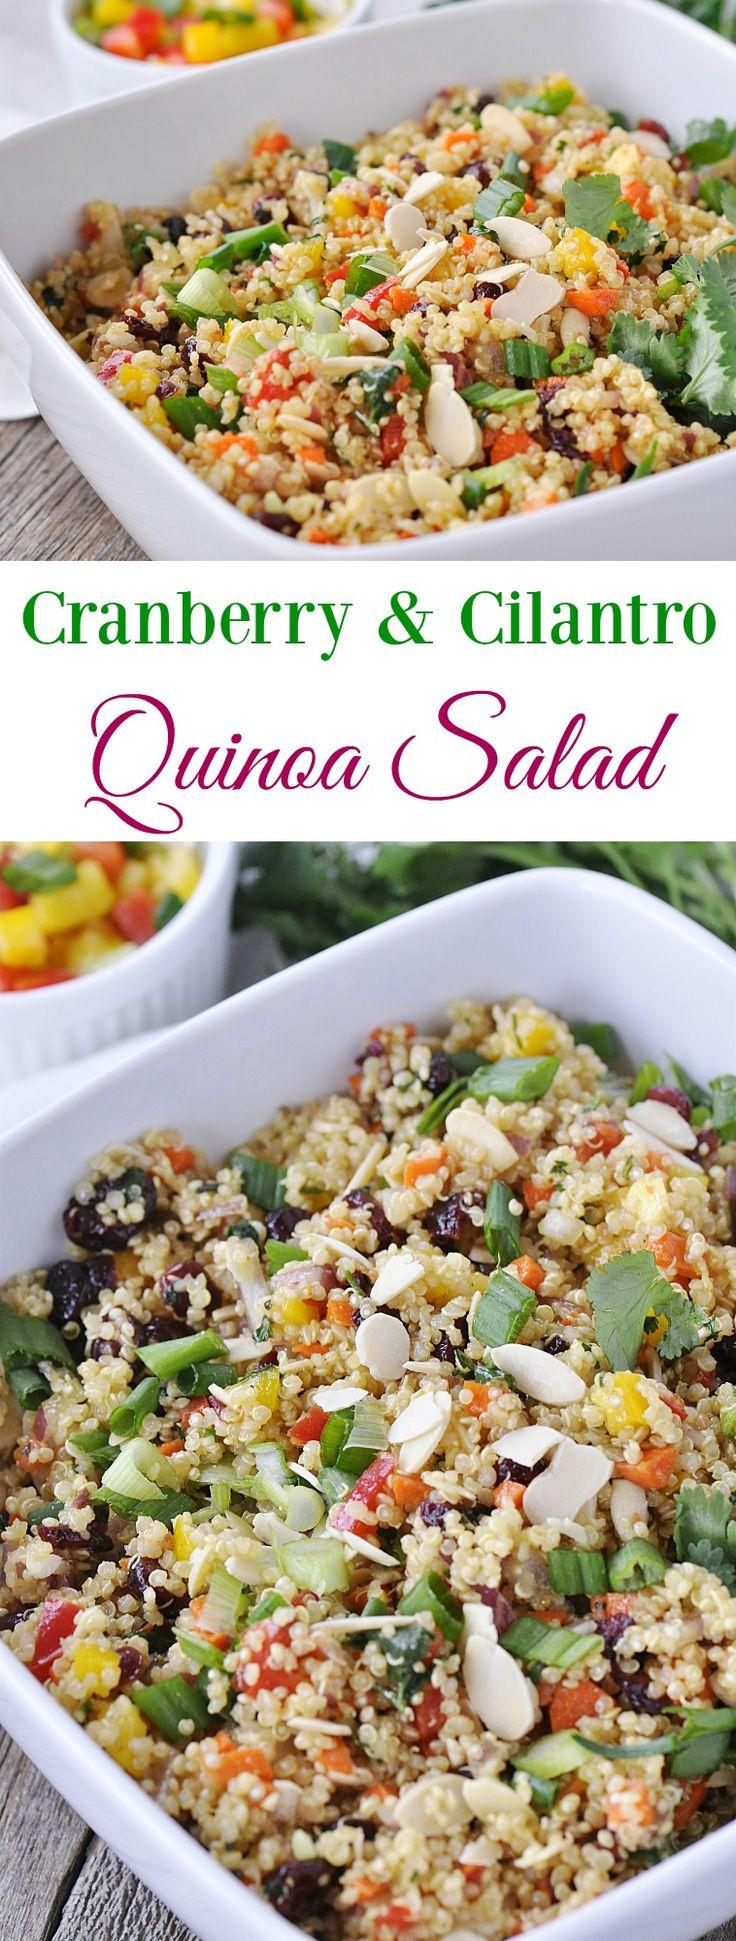 Cranberry & Cilantro Quinoa Salad is the perfect healthy side dish.